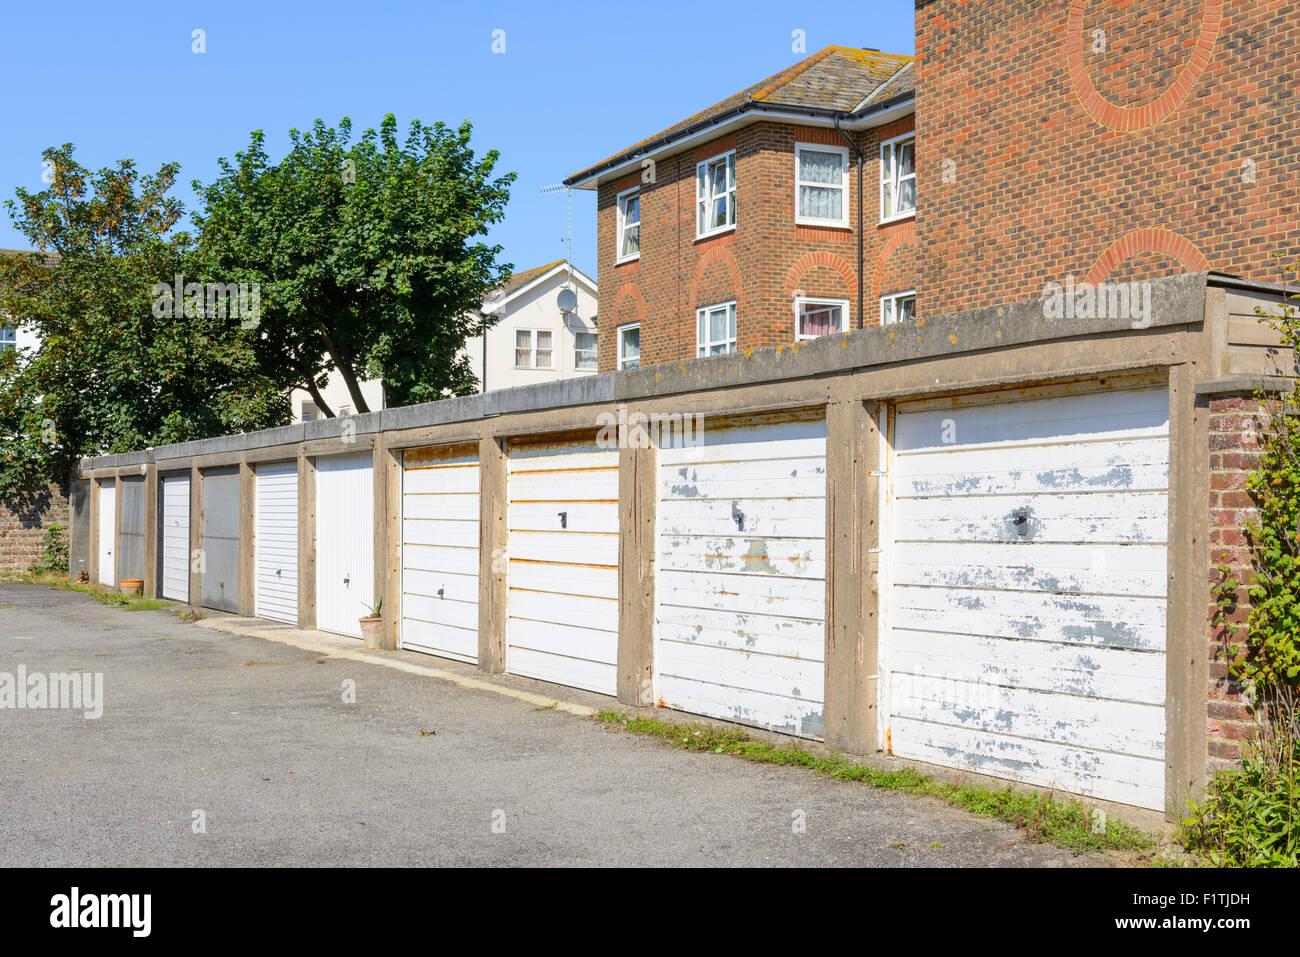 Fila de coches privados garajes en Inglaterra, Reino Unido. Imagen De Stock